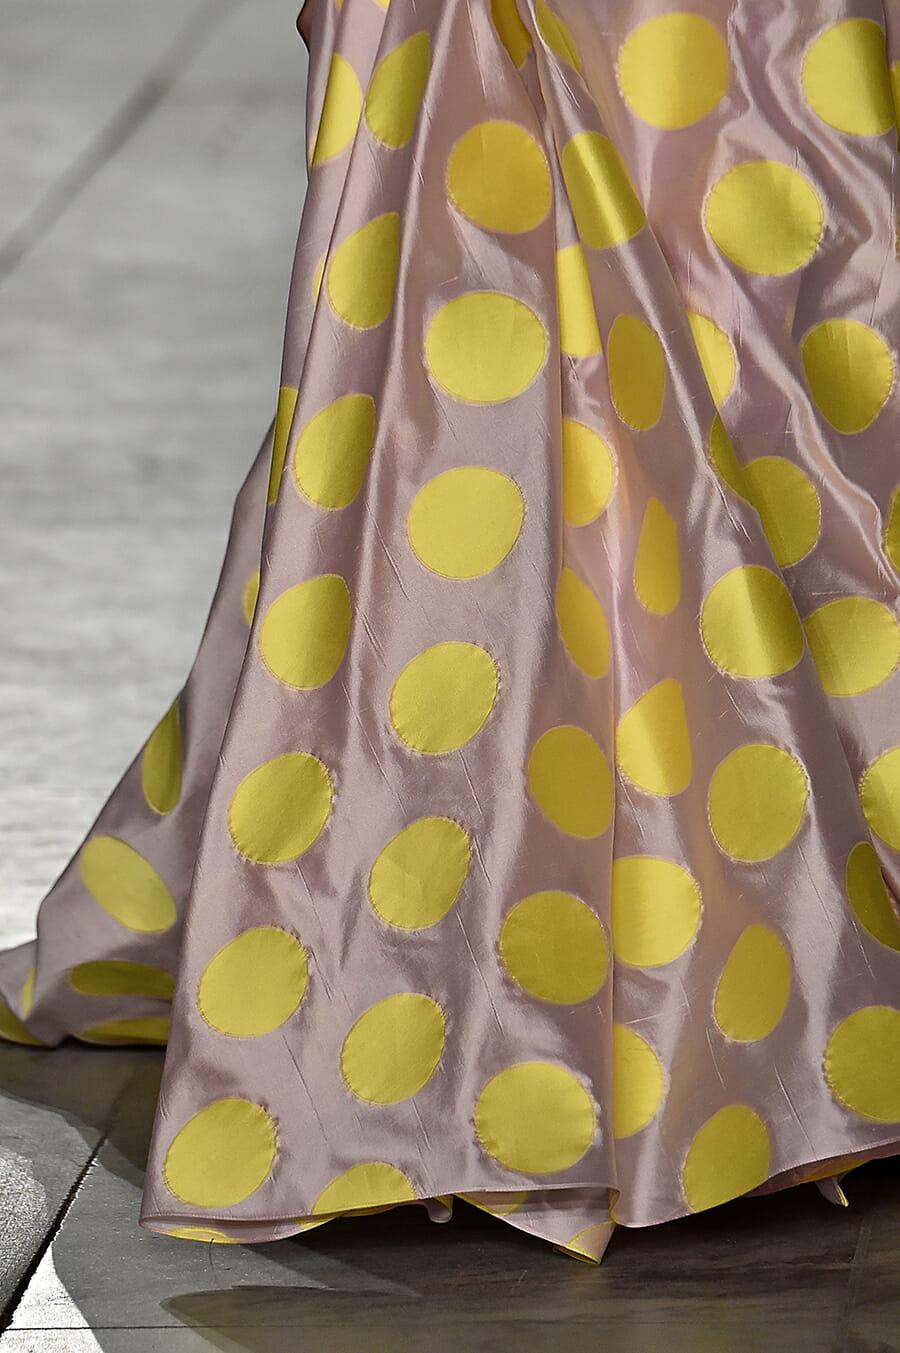 Carolina-Herrera-New-York-Fashion-Week-Spring-Summer-2018-NY-September-2017-look42-detail3